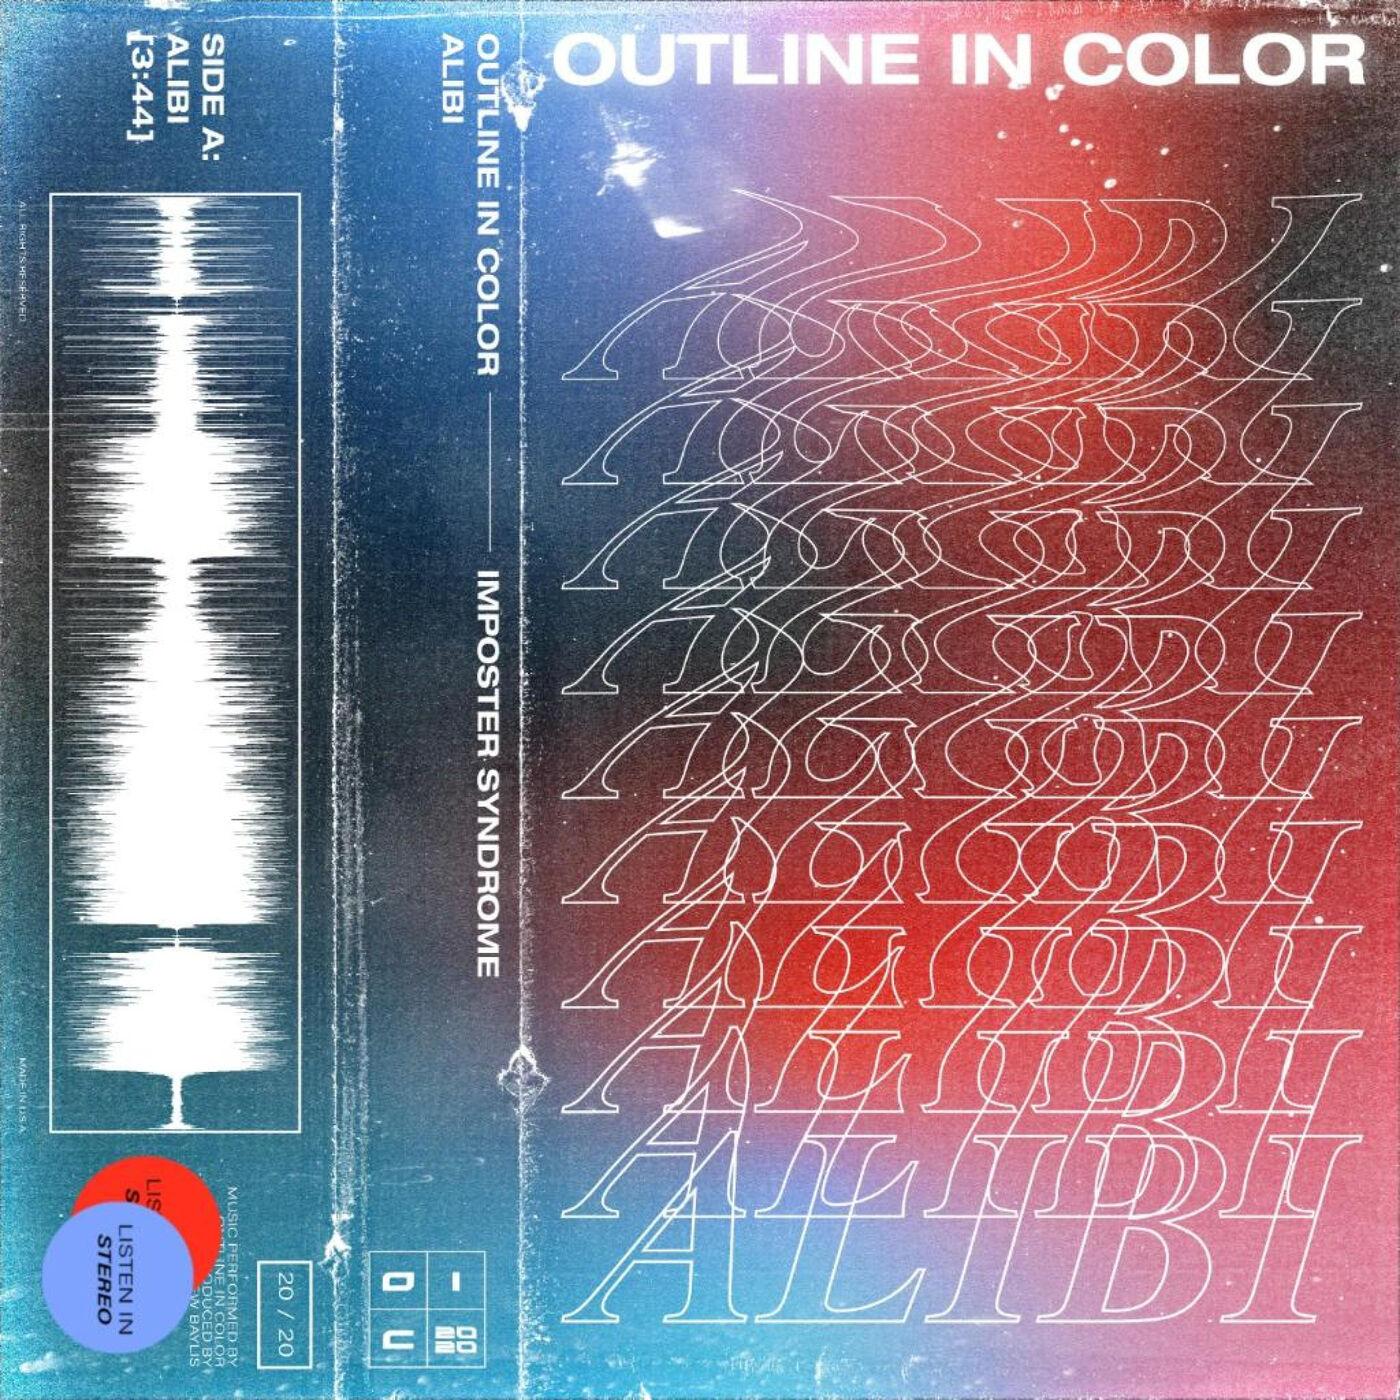 Outline In Color - Alibi [single] (2020)